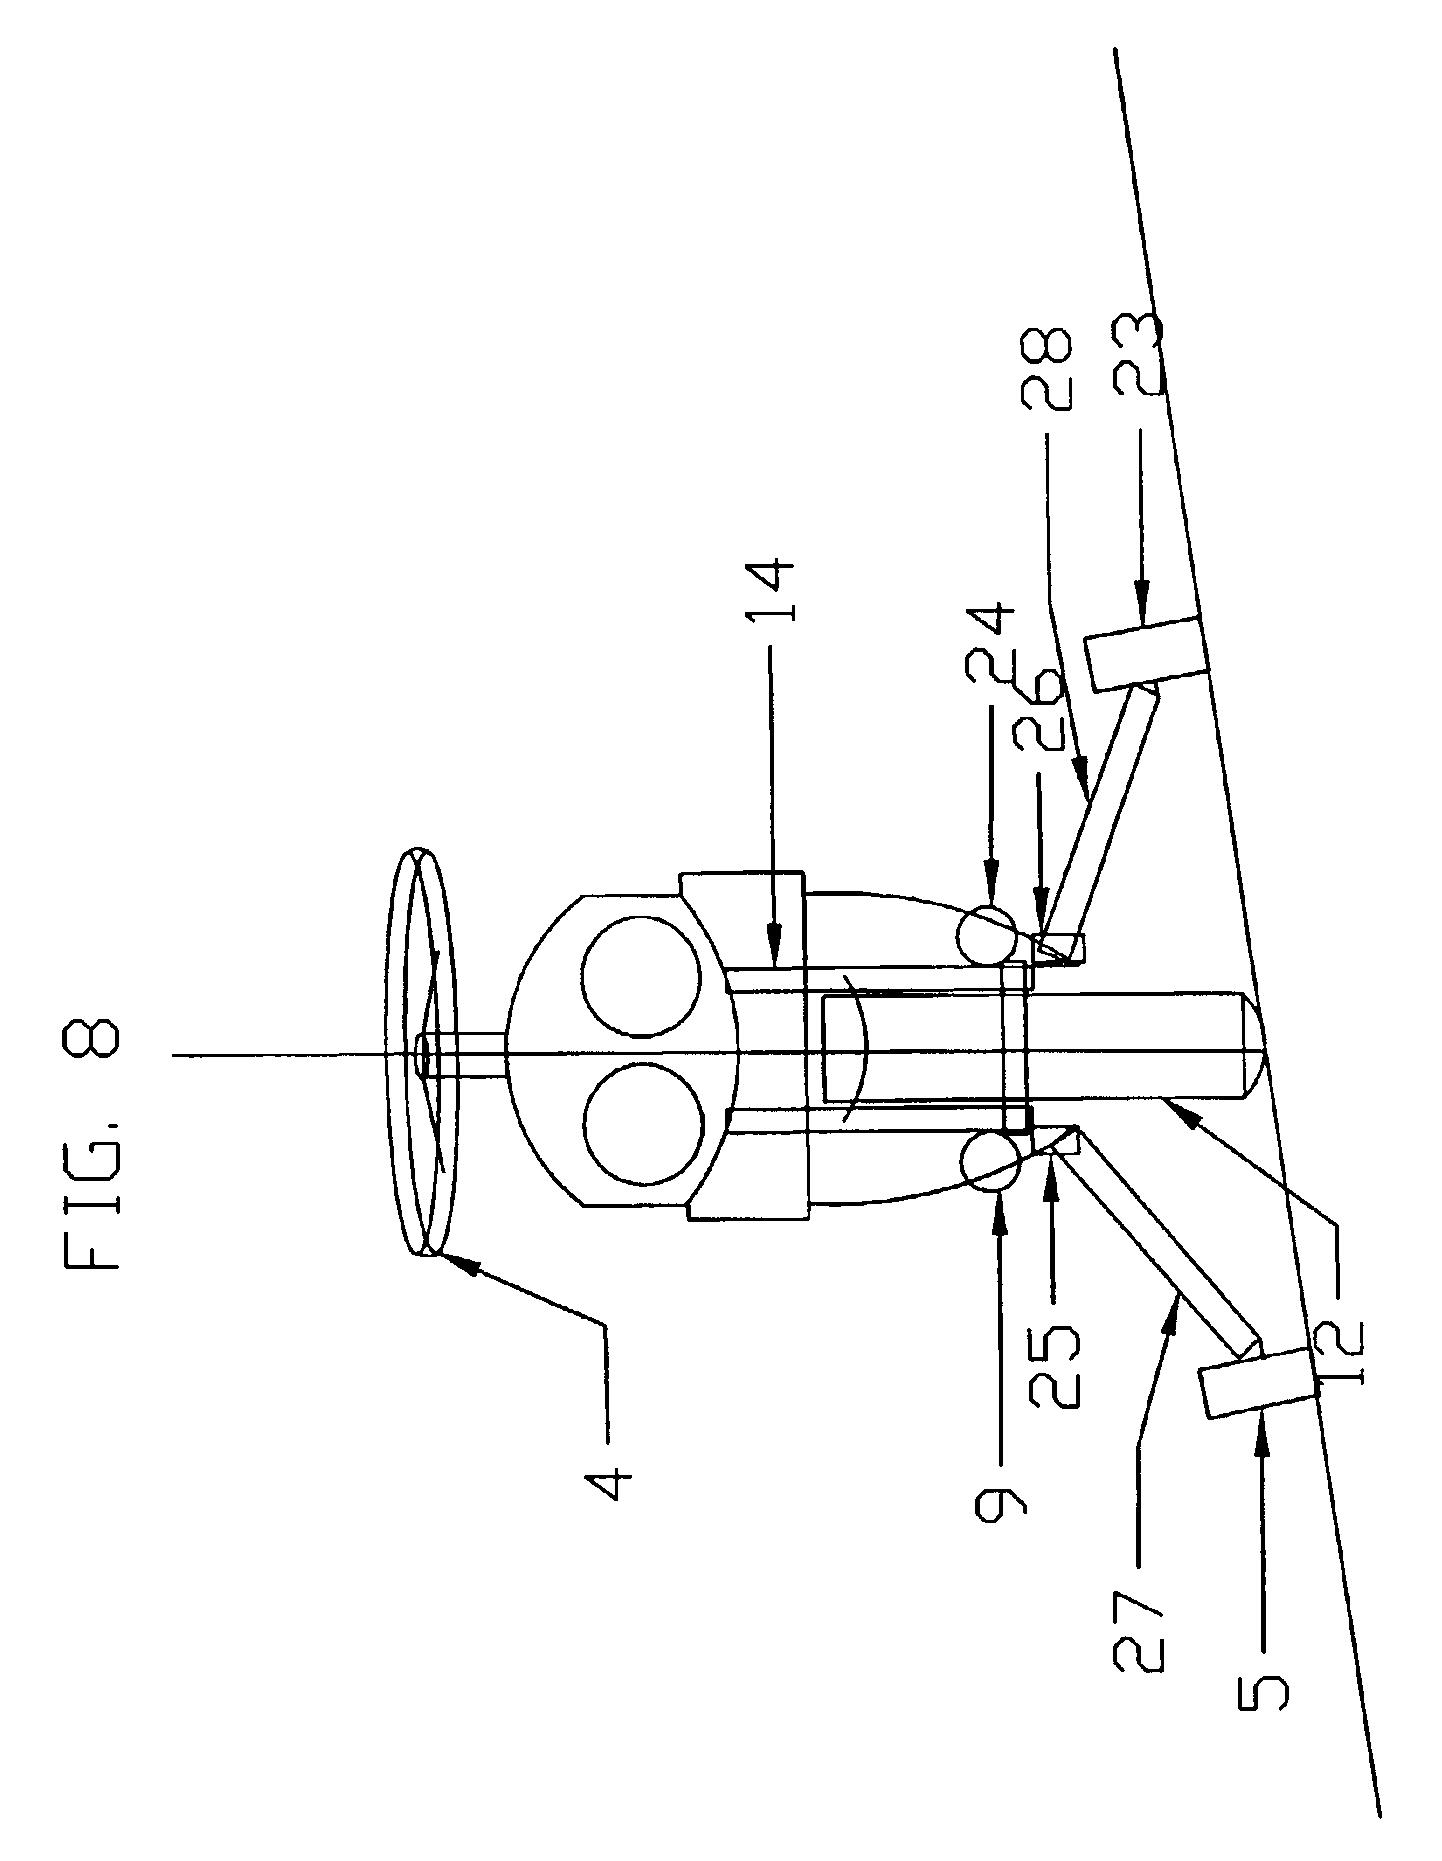 Brinks Motion Light Wiring Diagram